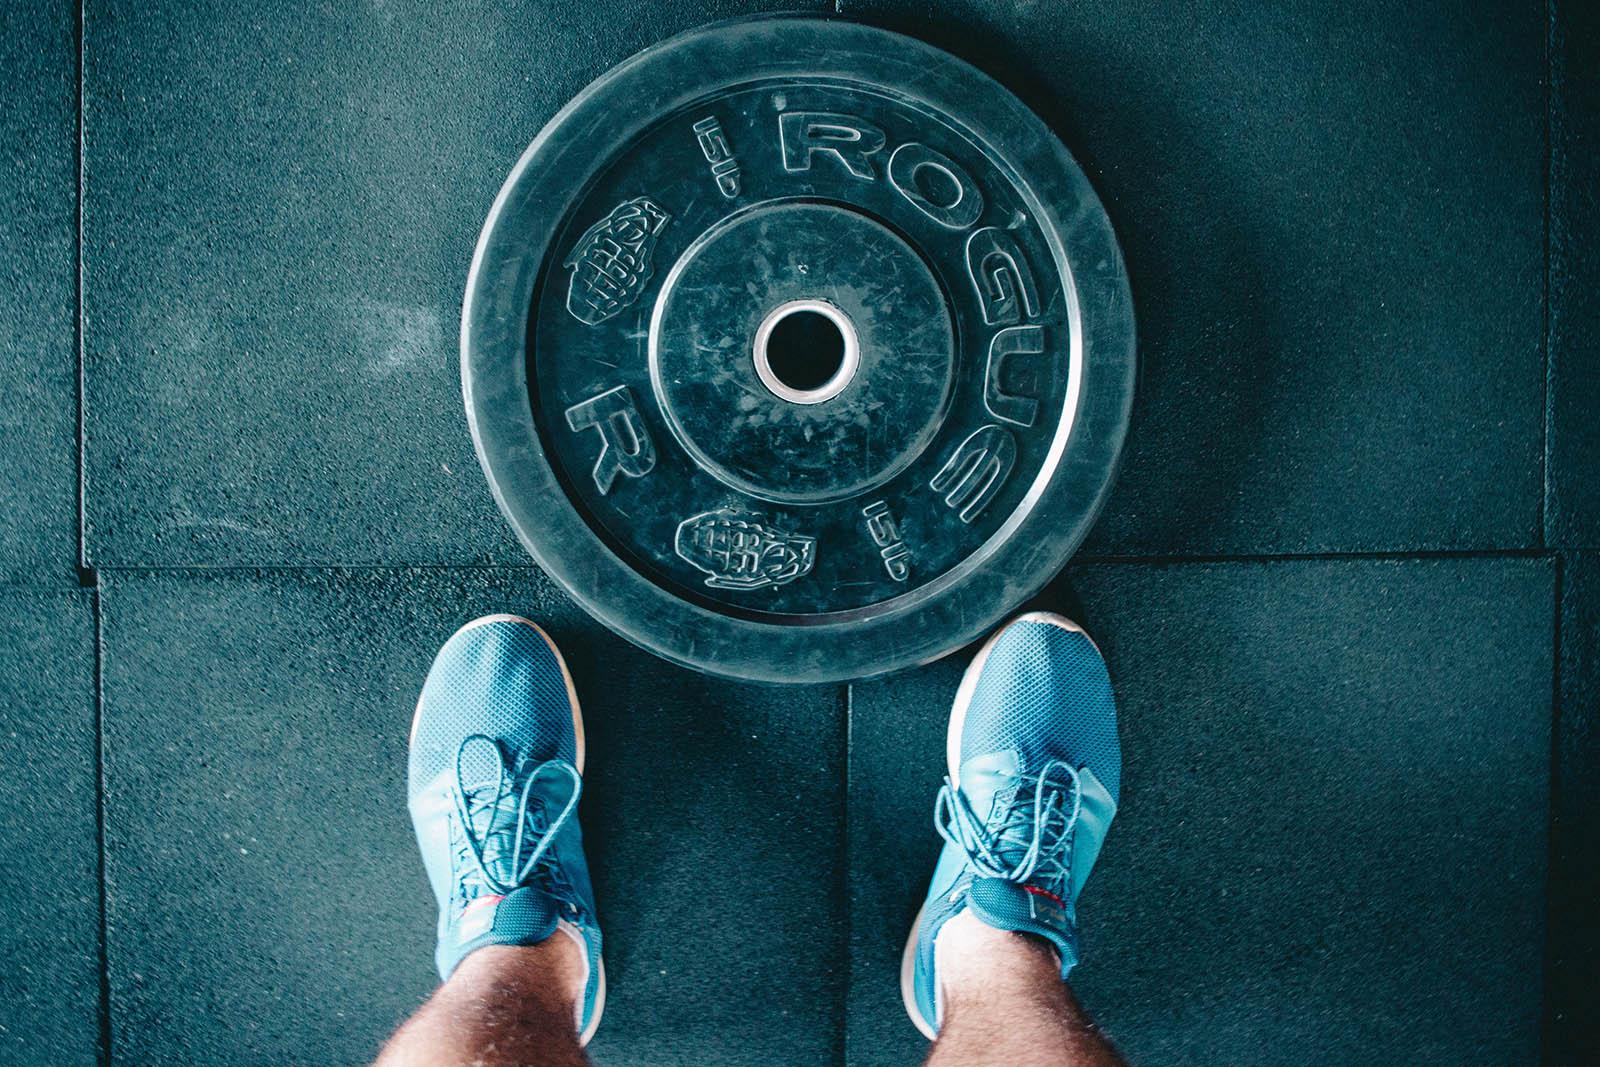 Kontinuerligt anpassa styrketräningen efter dagsform